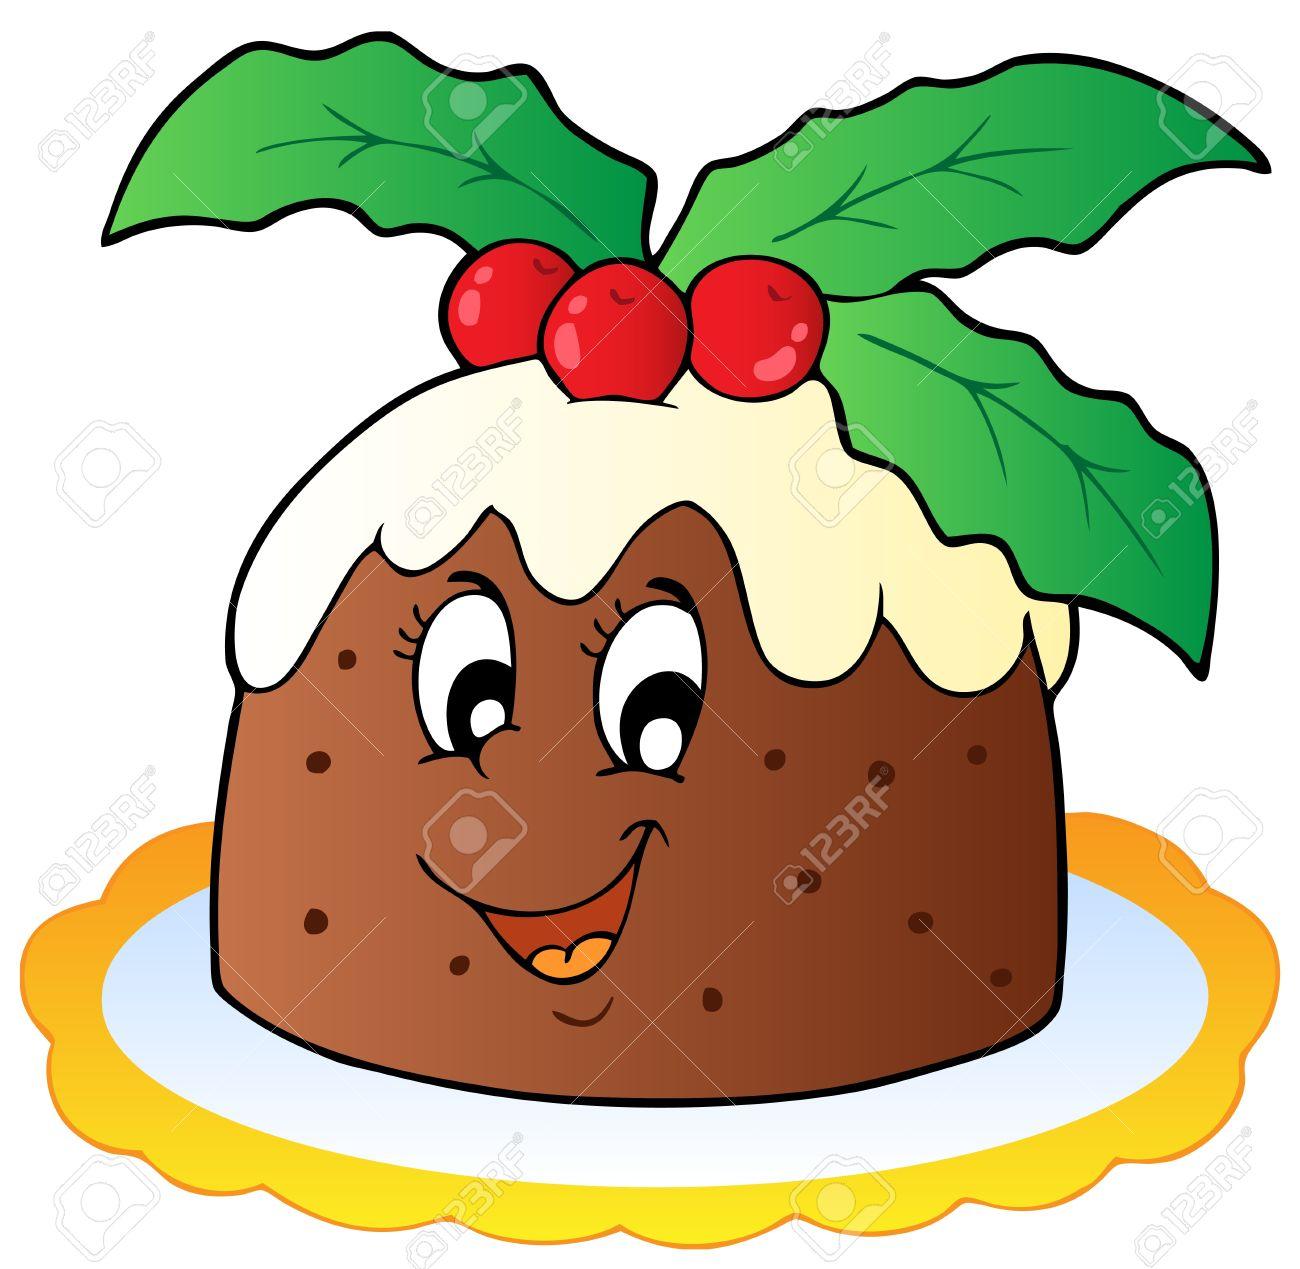 Cartoon Christmas pudding.